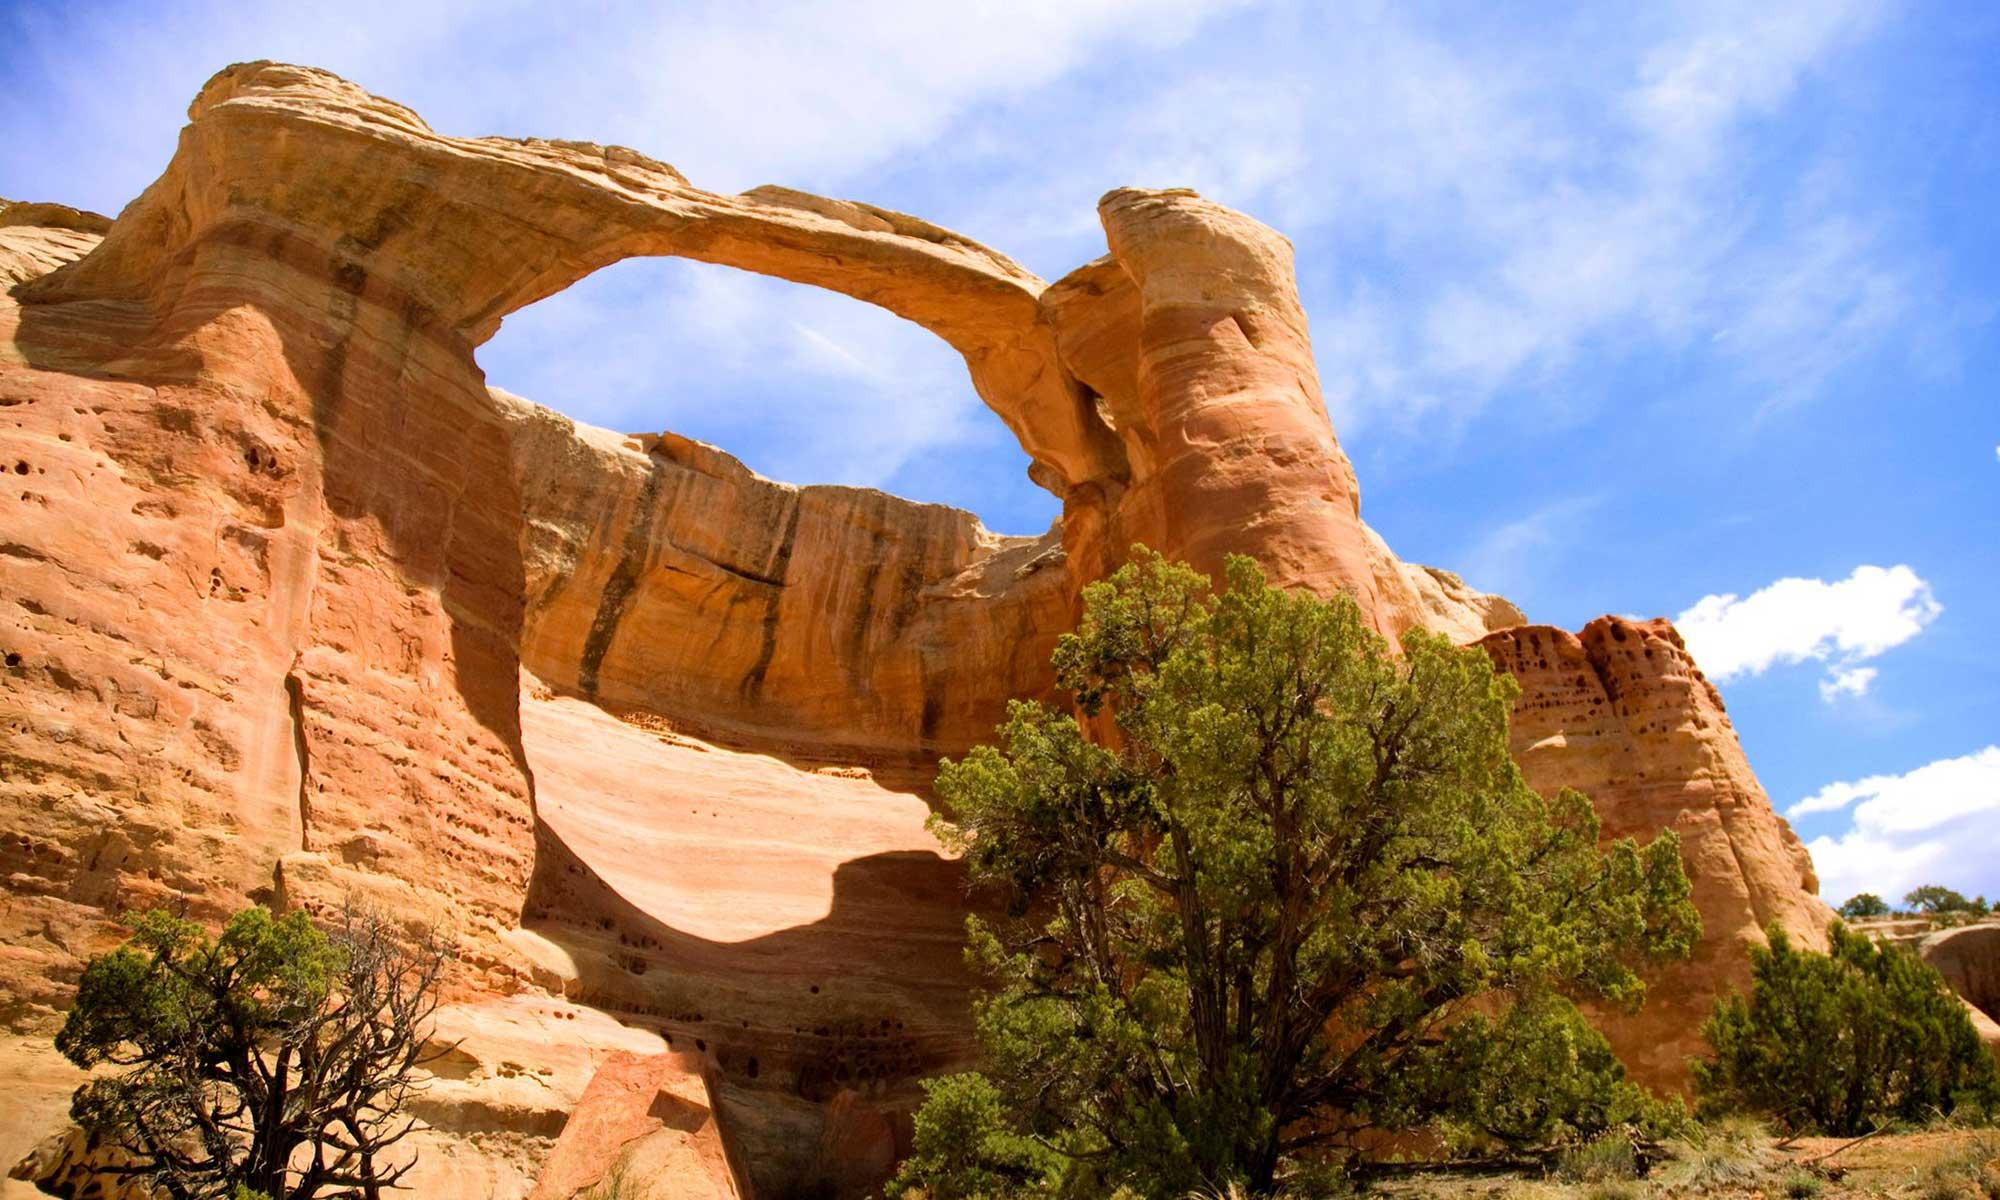 Colorado Canyons Association